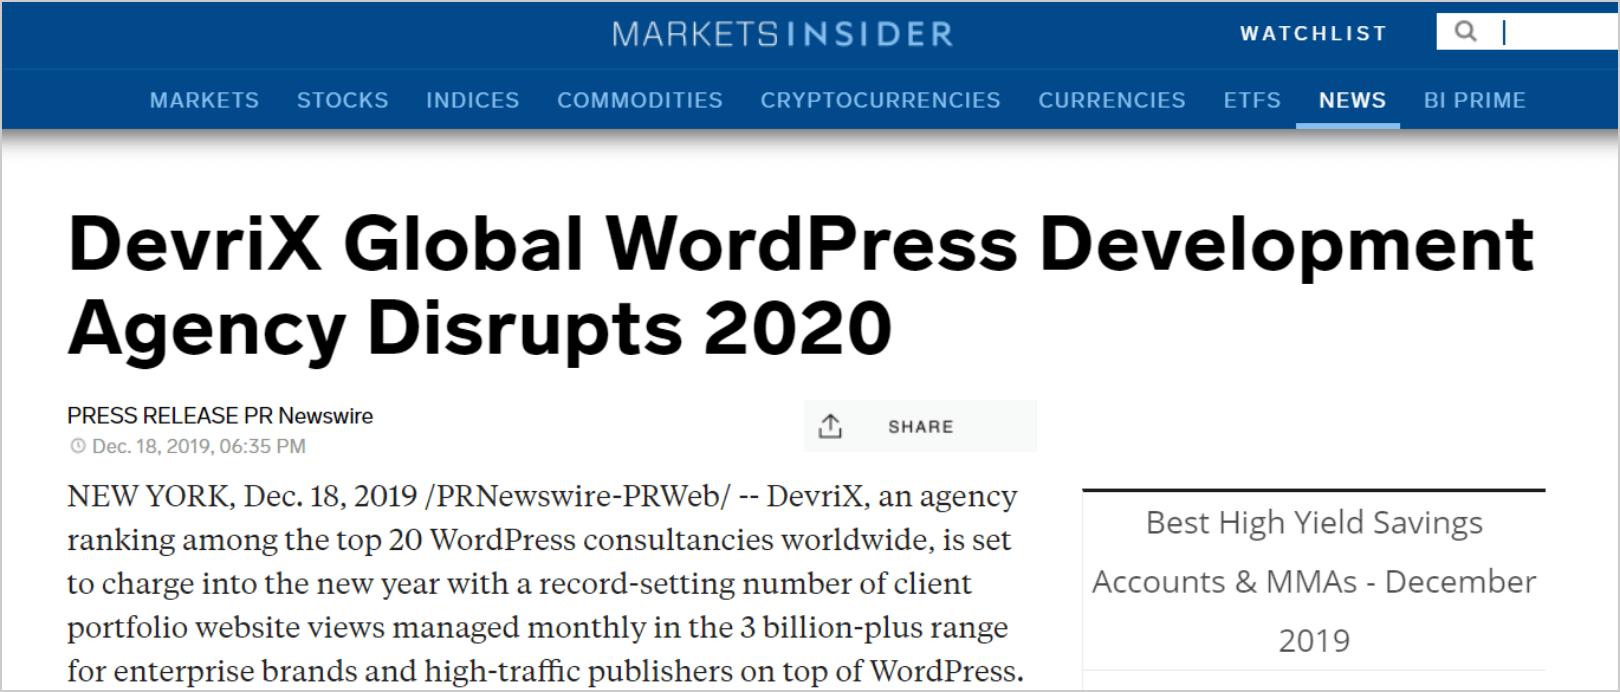 DevriX Global WordPress Development Agency Disrupts 2020